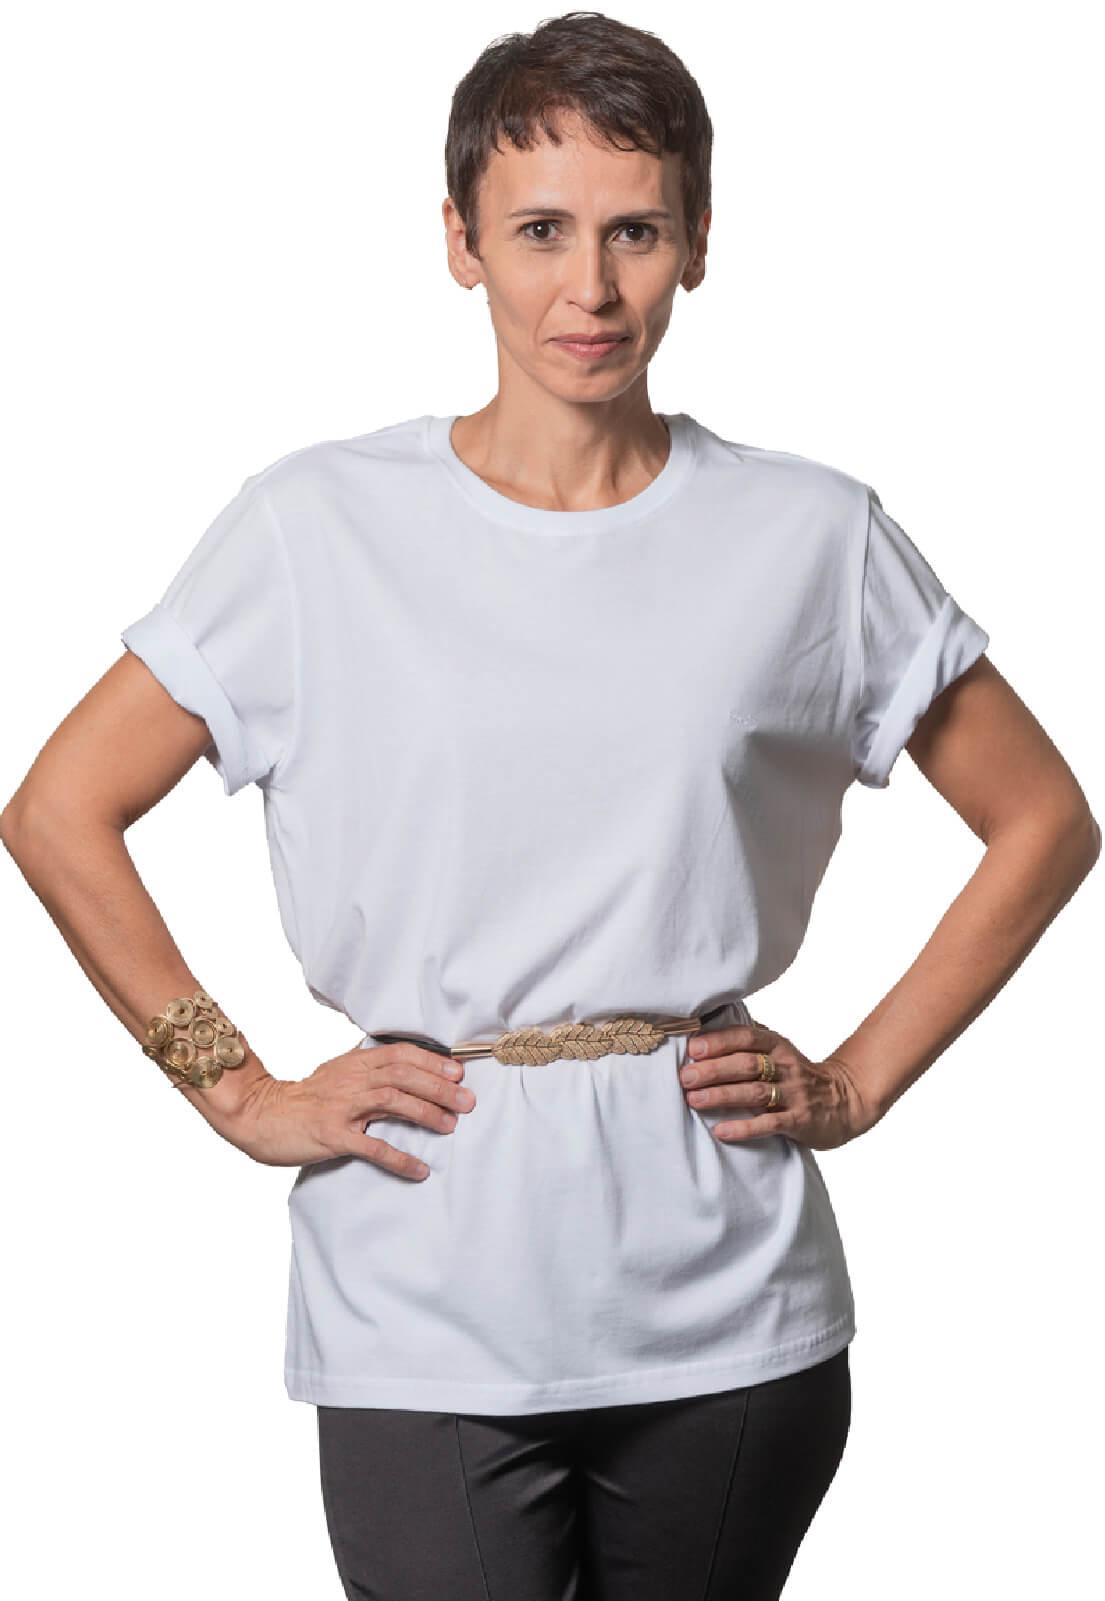 Camiseta Feminina 100% Algodão Super Premium, Na Cor Branca